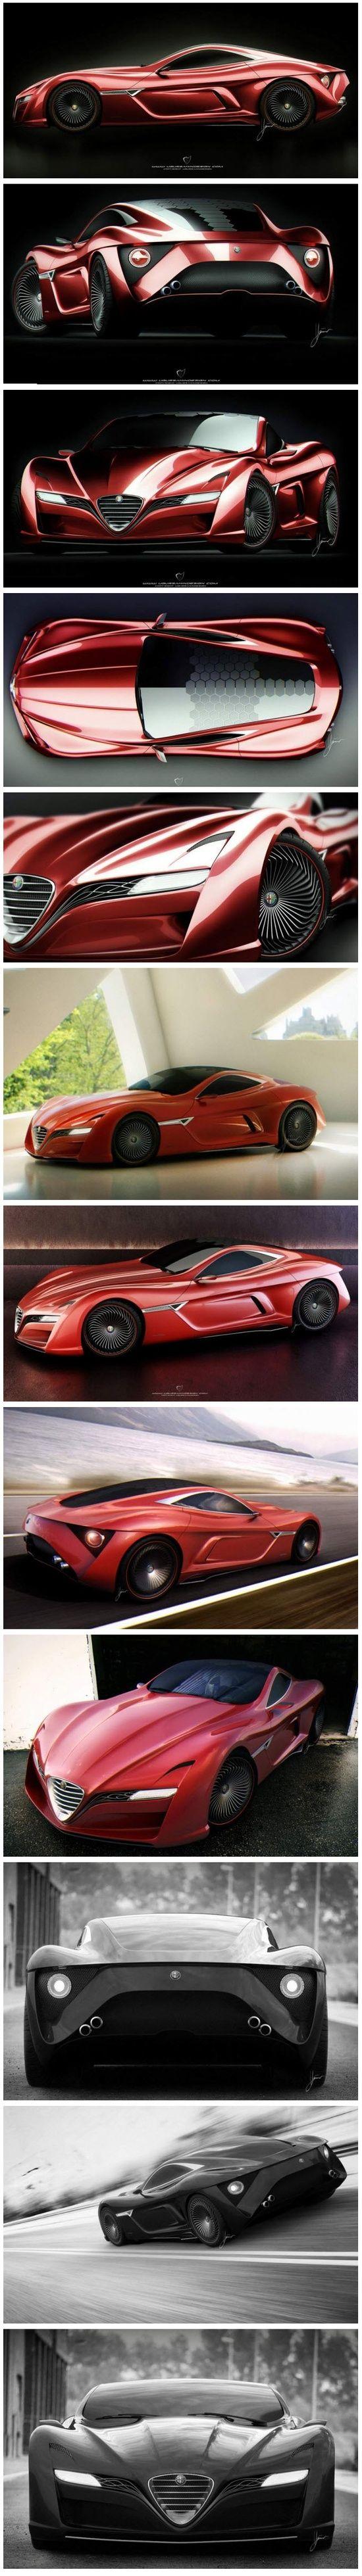 Alfa Romeo https://www.amazon.co.uk/Baby-Car-Mirror-Shatterproof-Installation/dp/B06XHG6SSY/ref=sr_1_2?ie=UTF8&qid=1499074433&sr=8-2&keywords=Kingseye